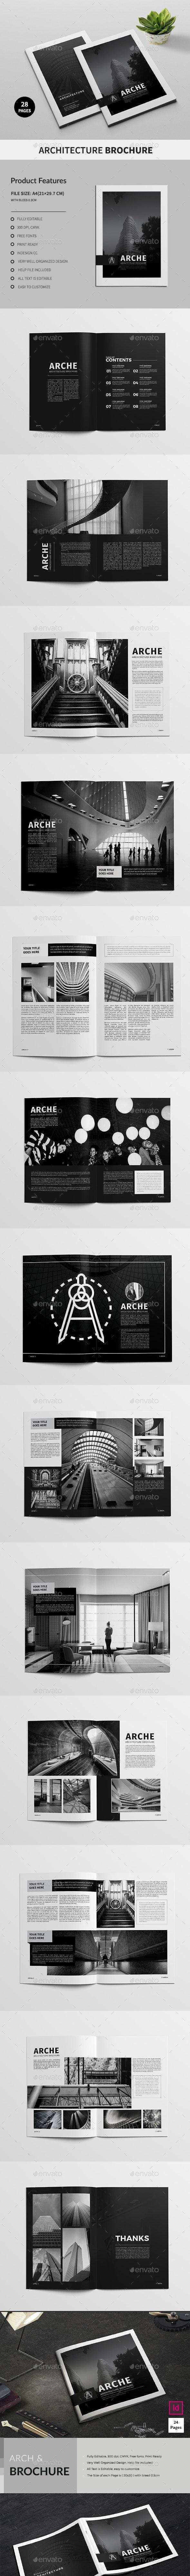 Architecture Brochures Bundle - Corporate Brochures